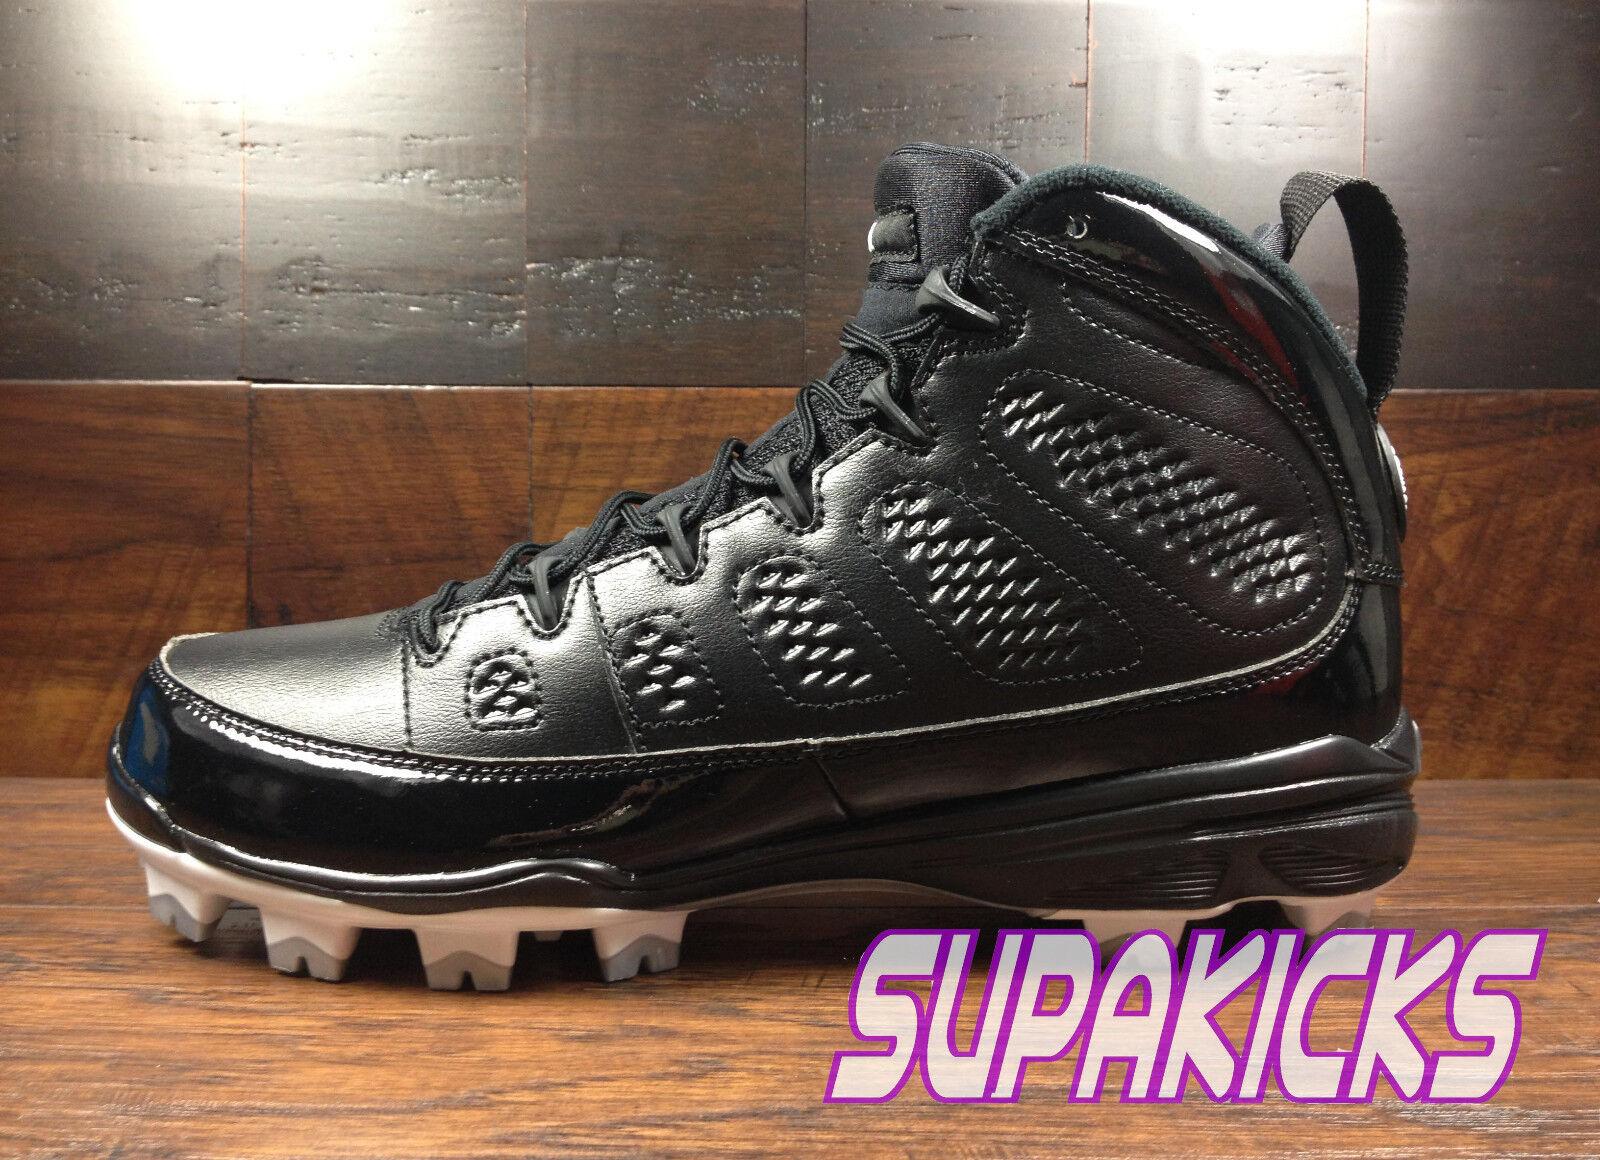 sports shoes 1d21f eb0ca ... new zealand 2018 air jordan ix 9 mcs re2pect descuento béisbol negro blanco  descuento re2pect hombre